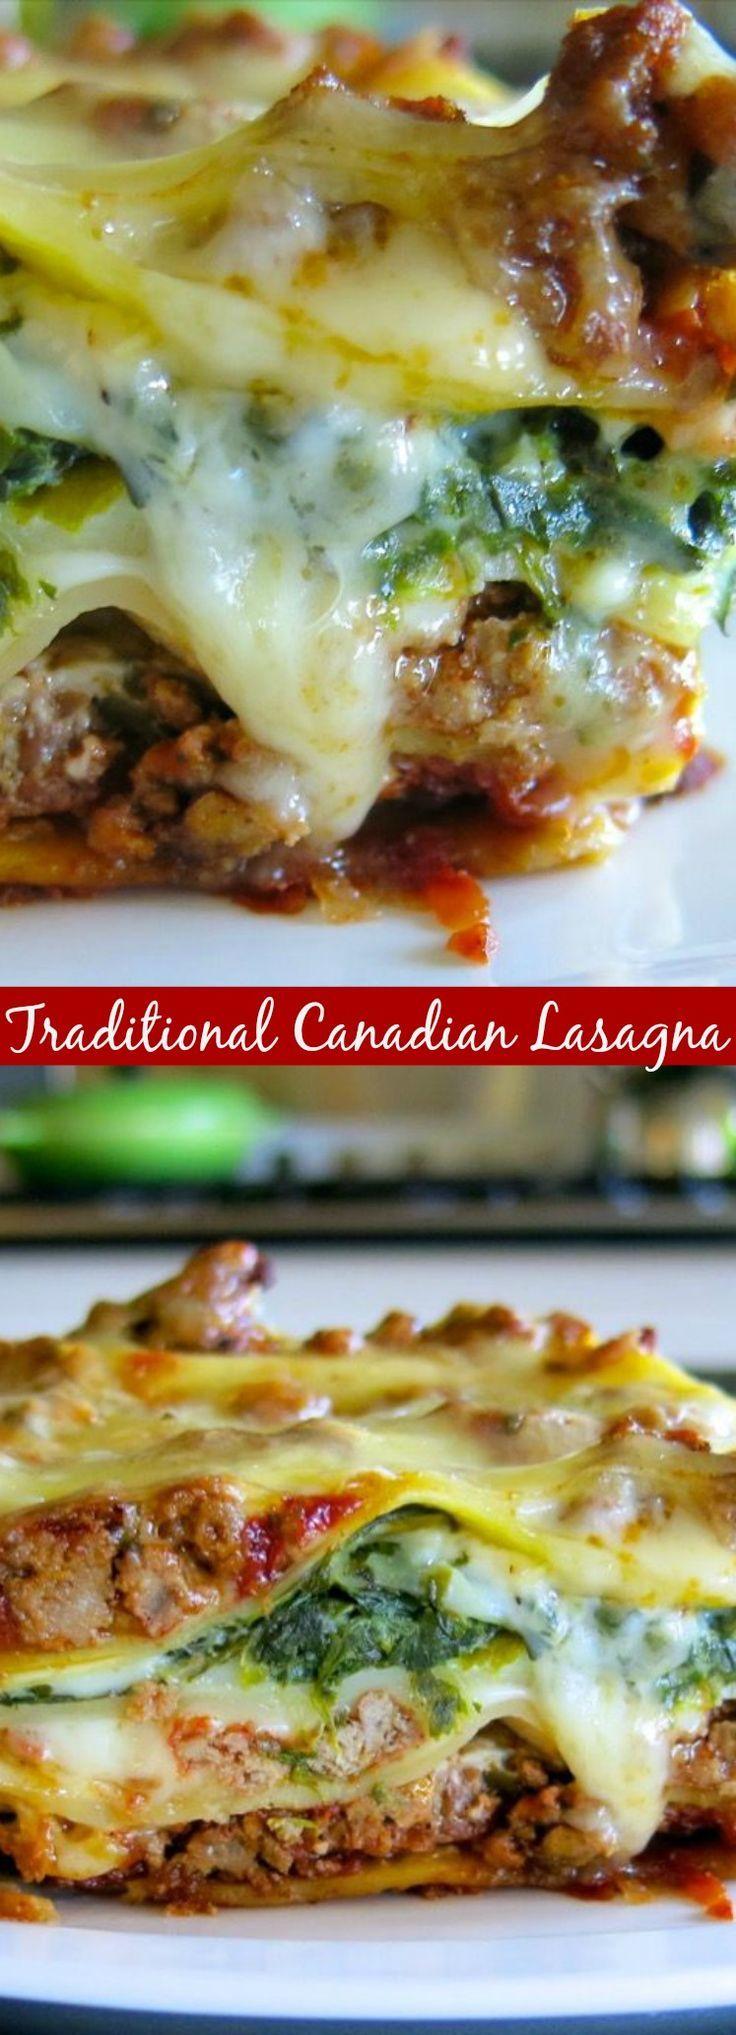 Traditional Canadian Lasagna